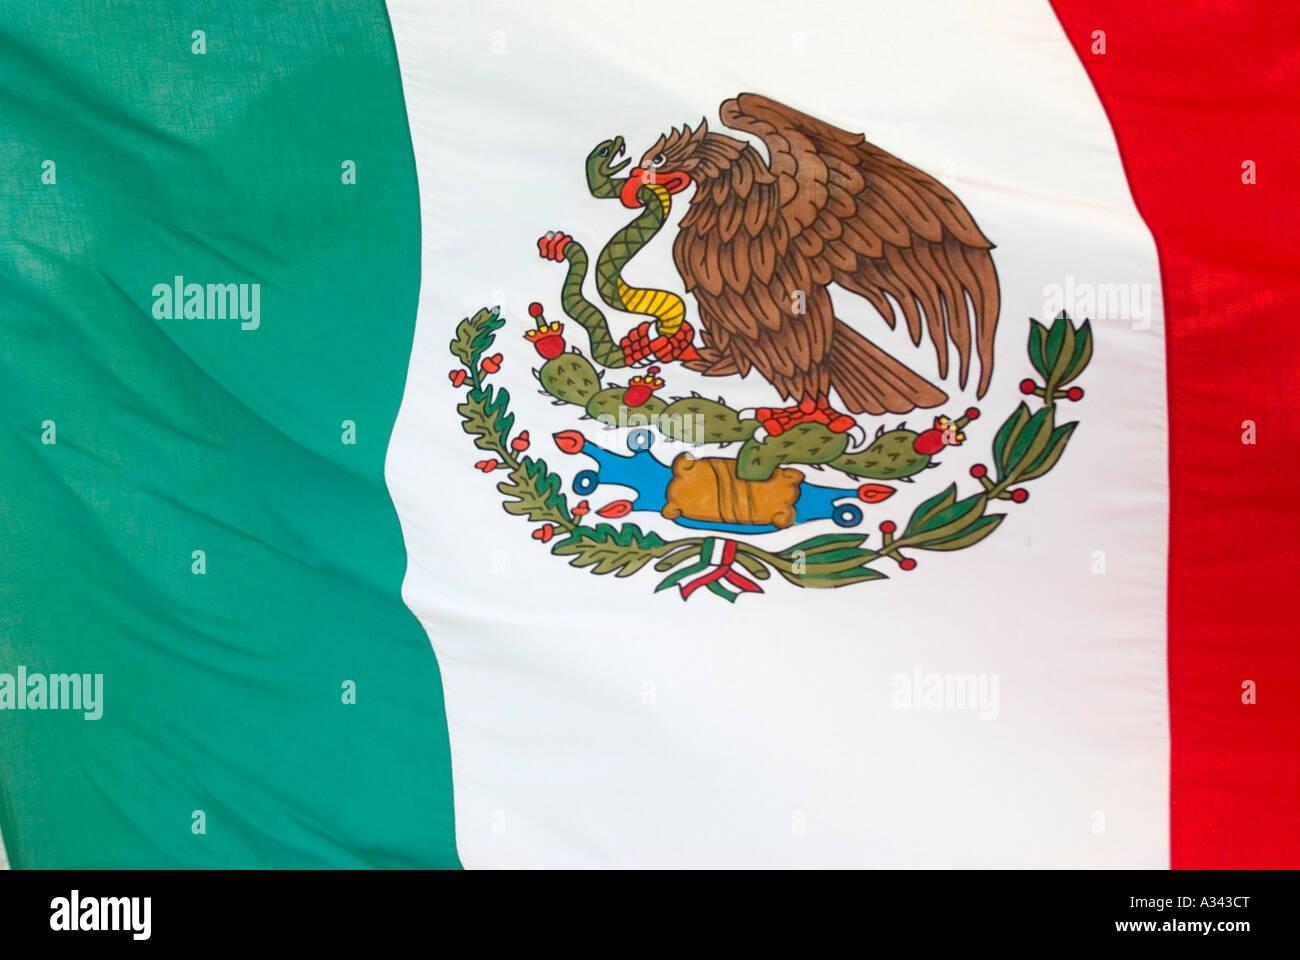 Mexican flag flying in Cabo San Lucas, Baja California, Mexico. - Stock Image